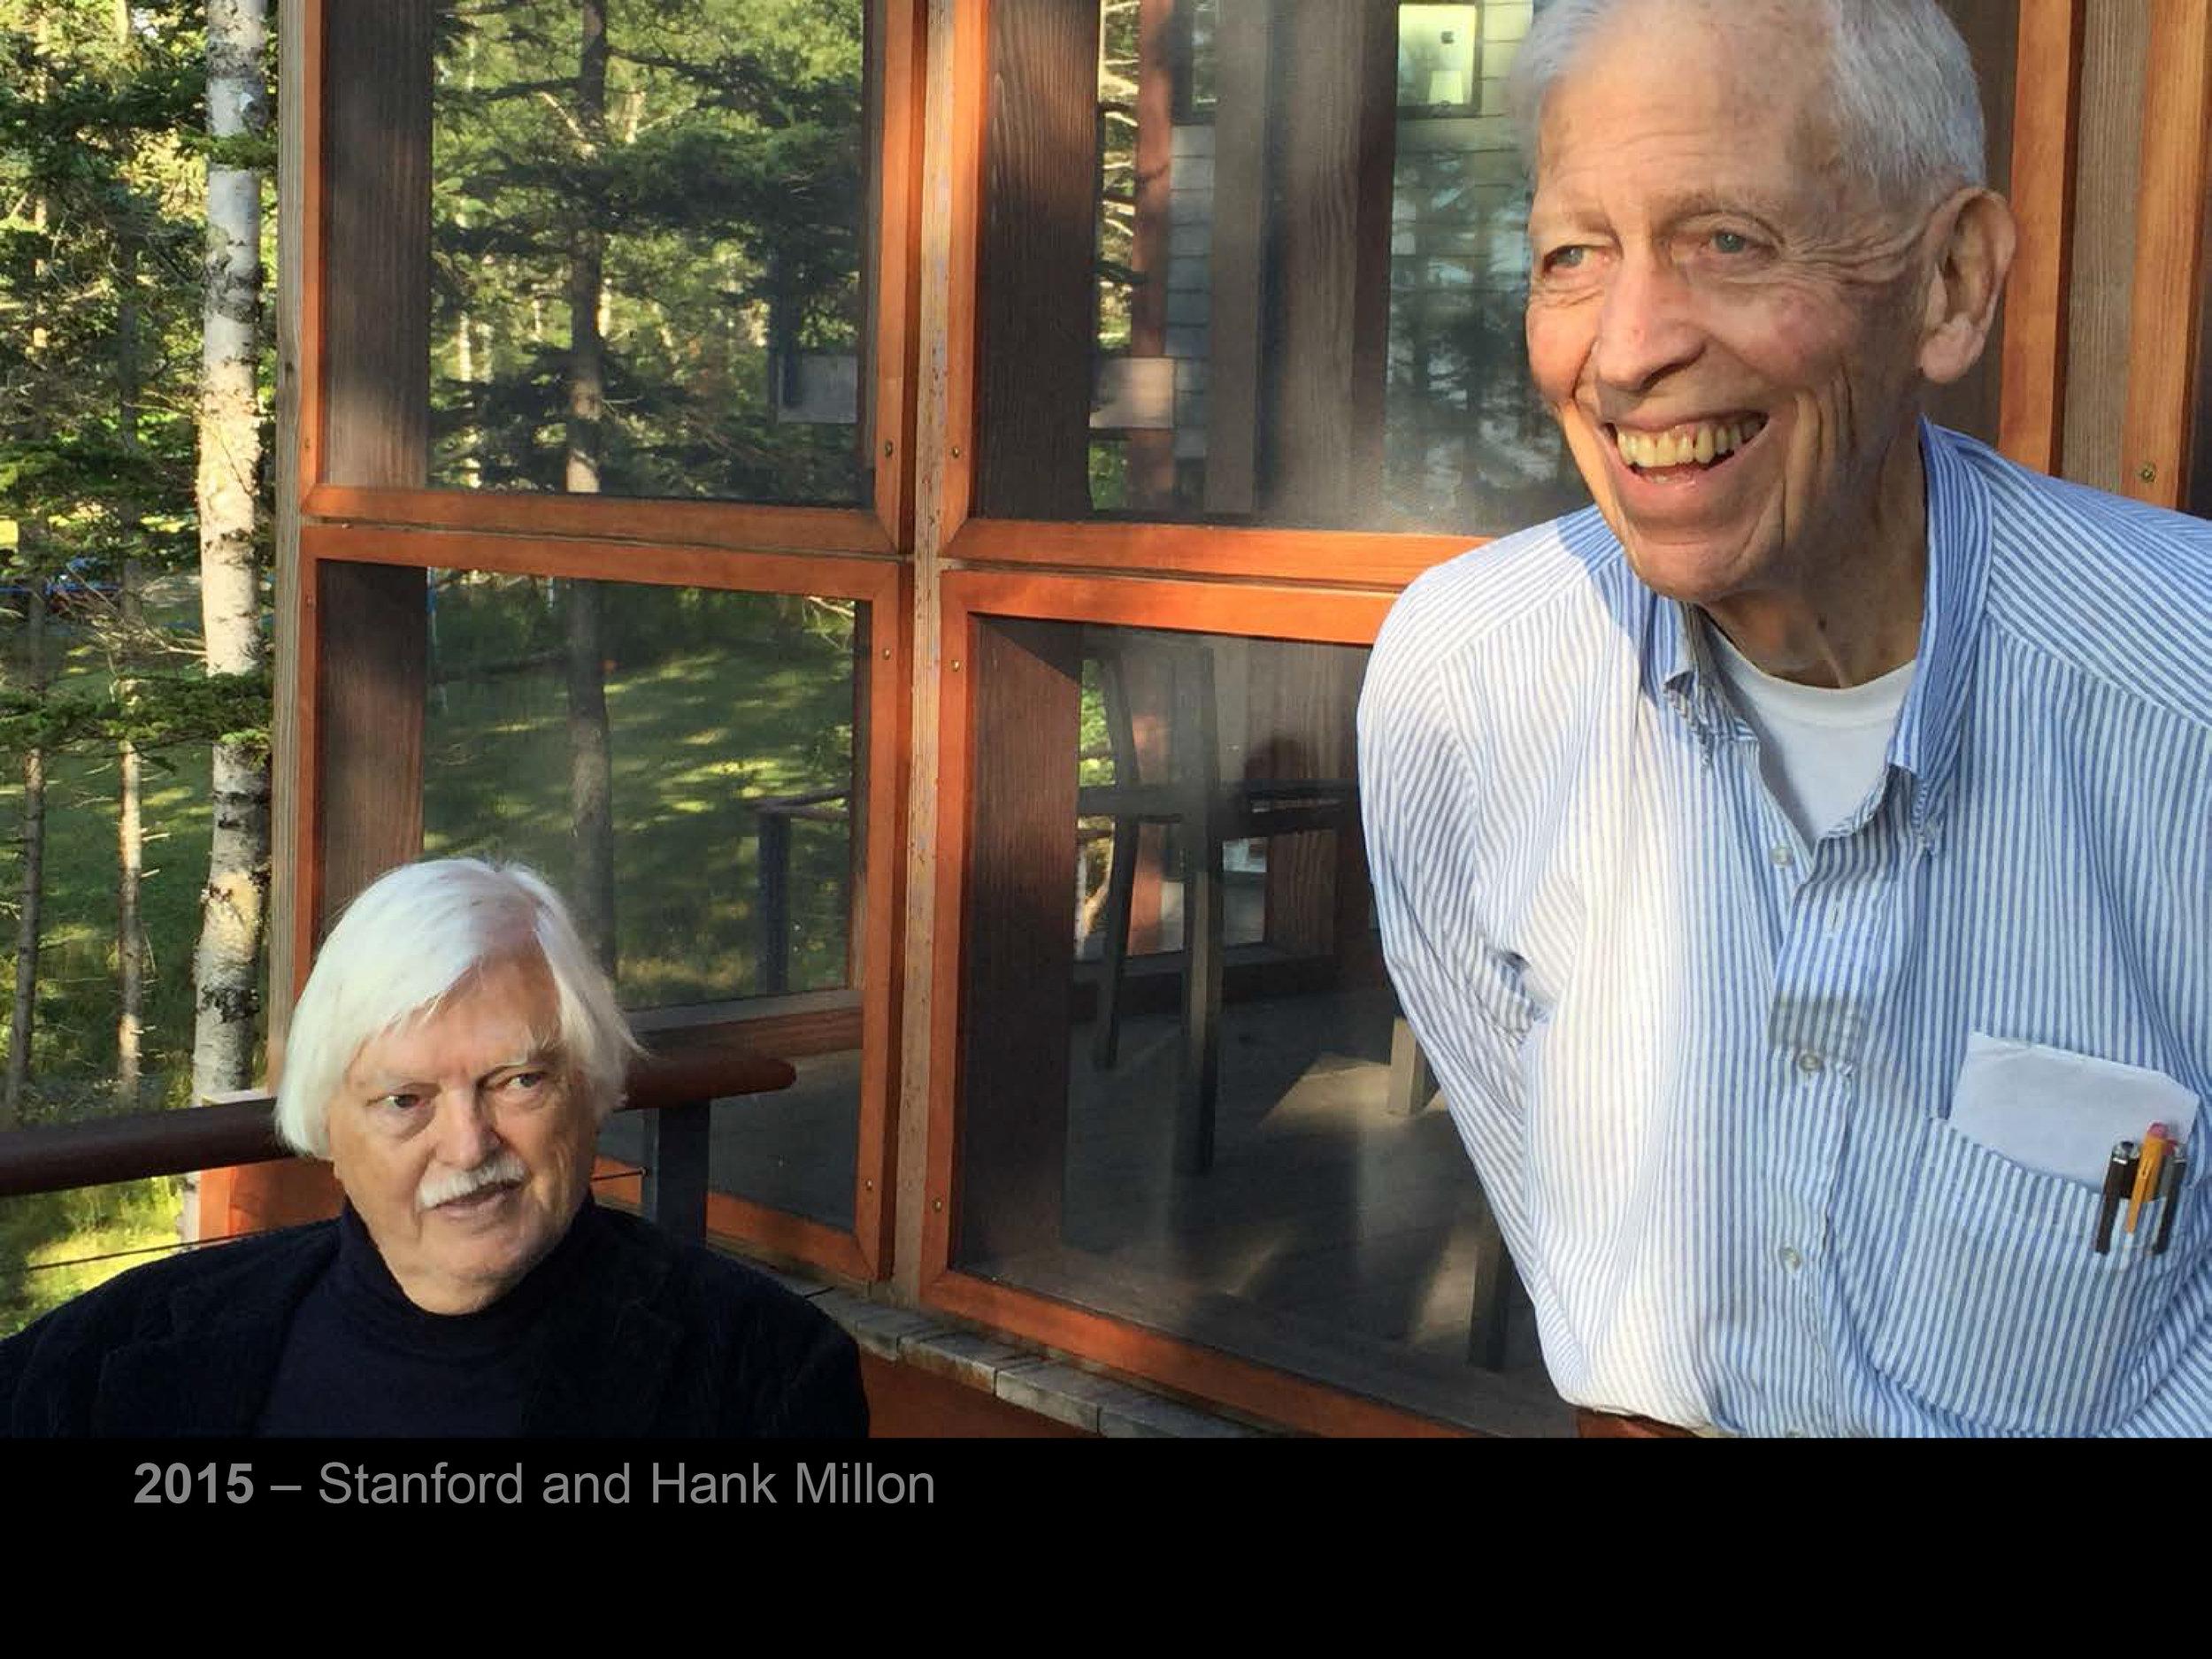 MIT ARCHITECTURE 150 SAN FRANCISCO SLIDESHOW-52 copy.jpg